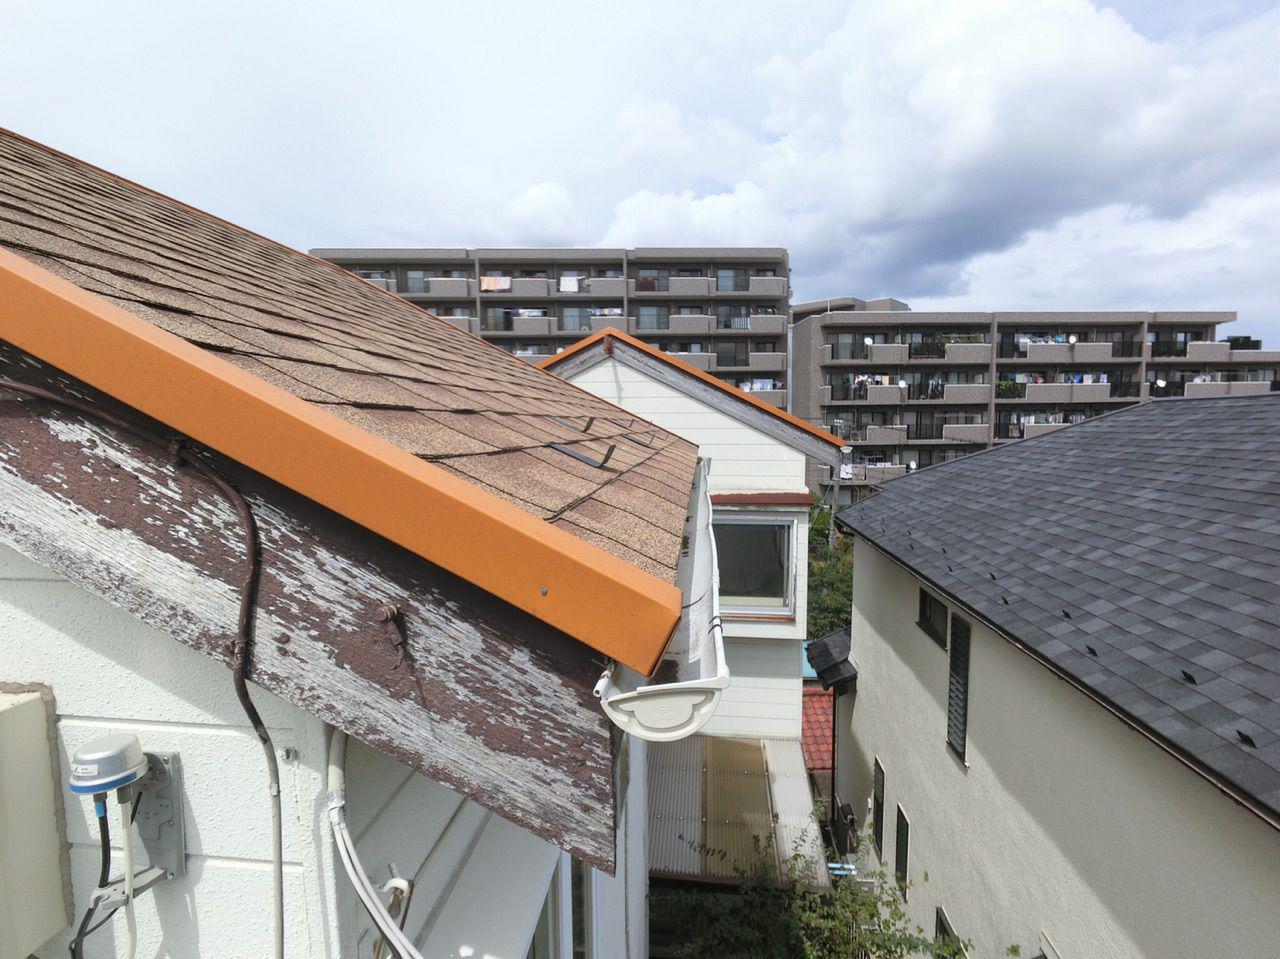 横浜市港南区で火災保険及び地震保険申請のご報告!住宅保険活用術